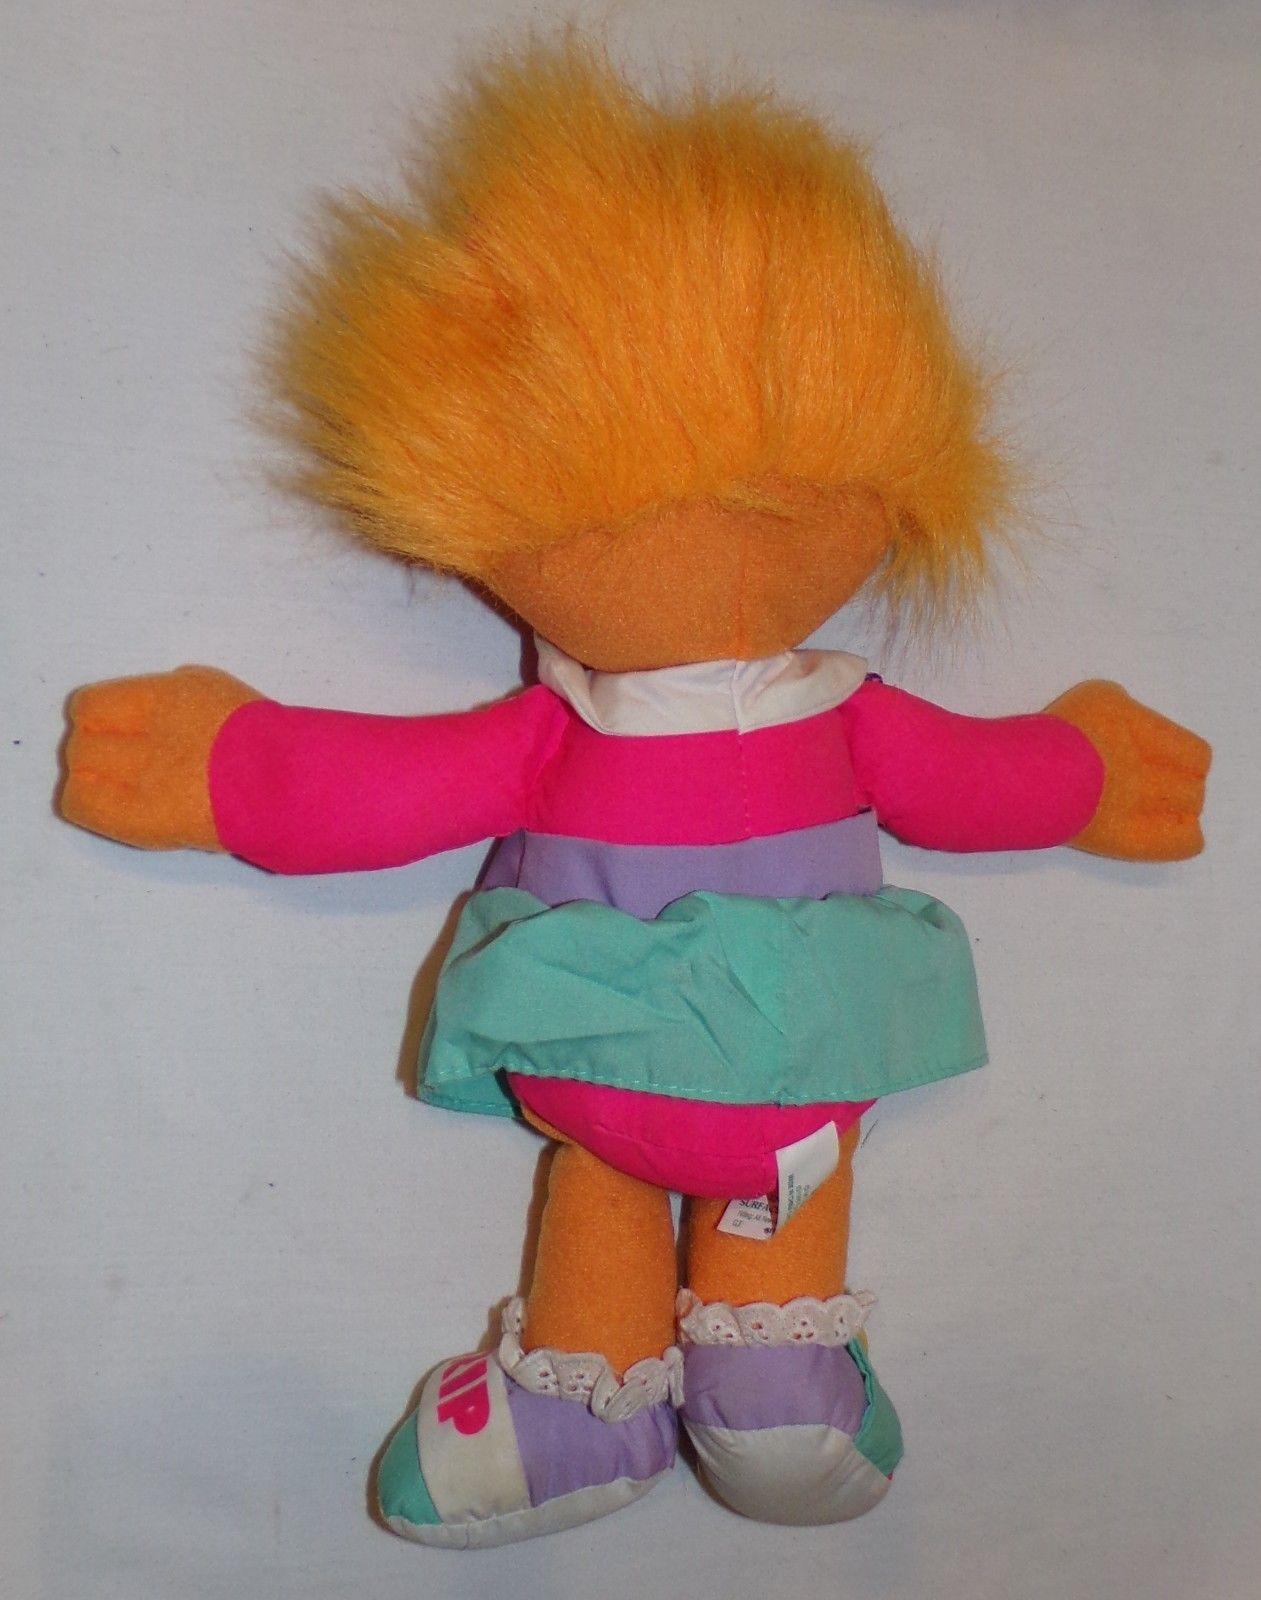 Jim Henson Sesame Street Dress Me Up Zoe and similar items